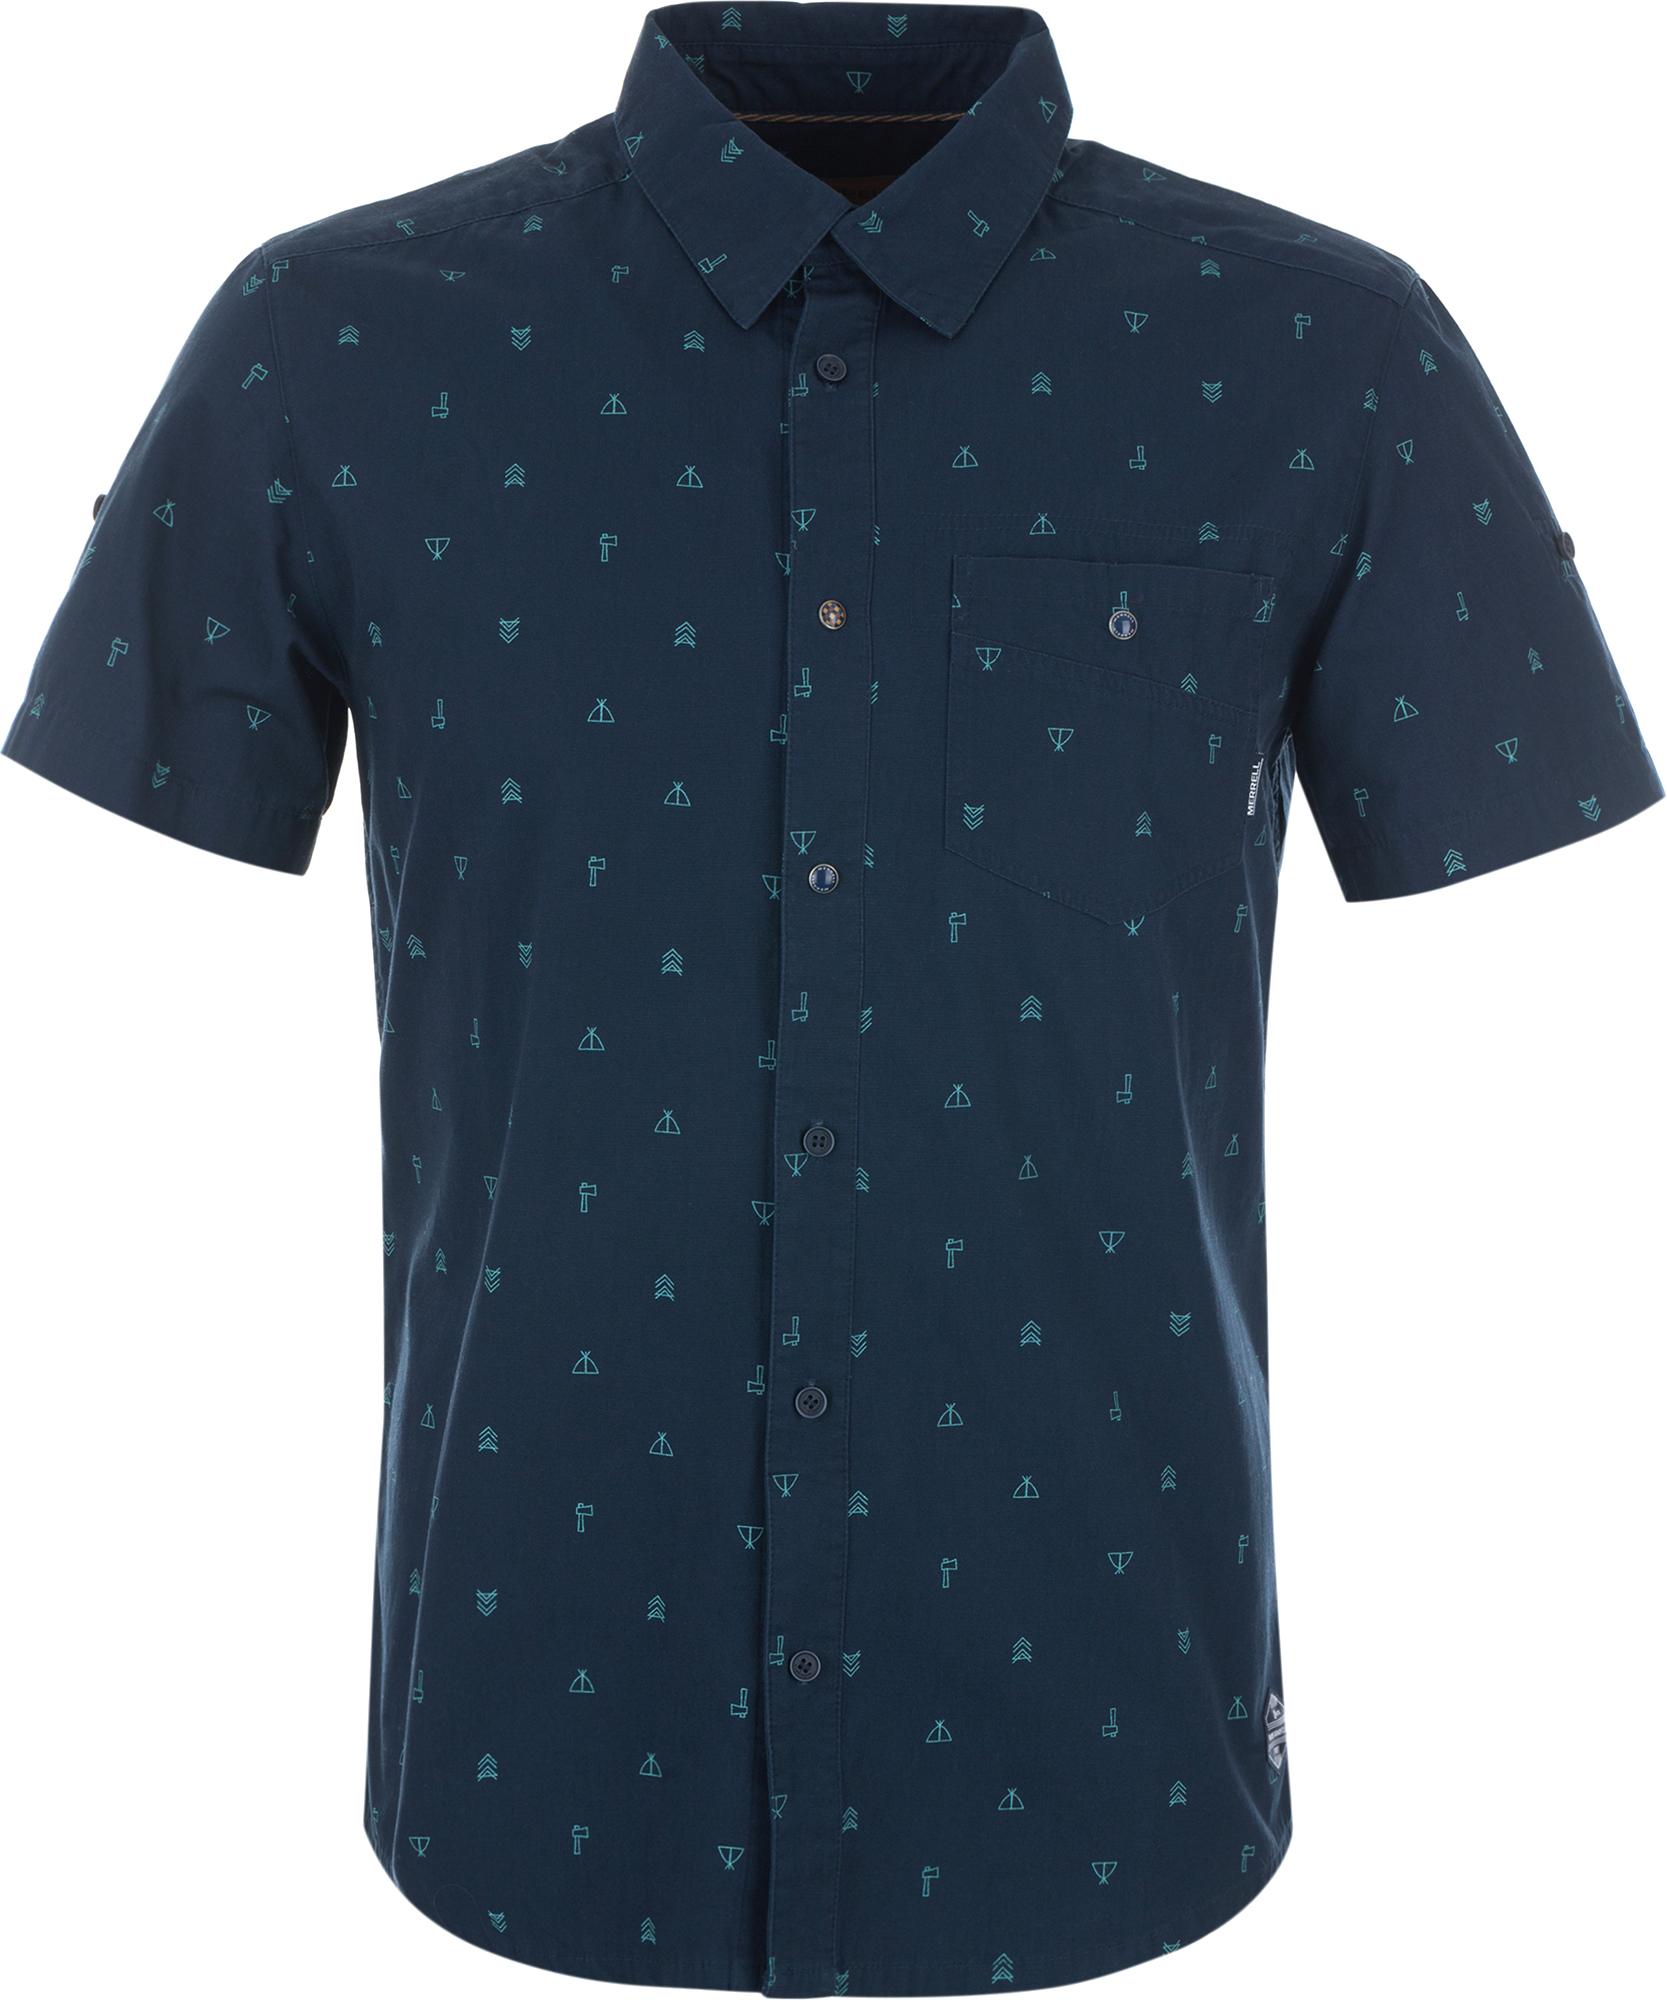 Merrell Рубашка мужская Merrell merrell рубашка с длинным рукавом женская merrell cilicia